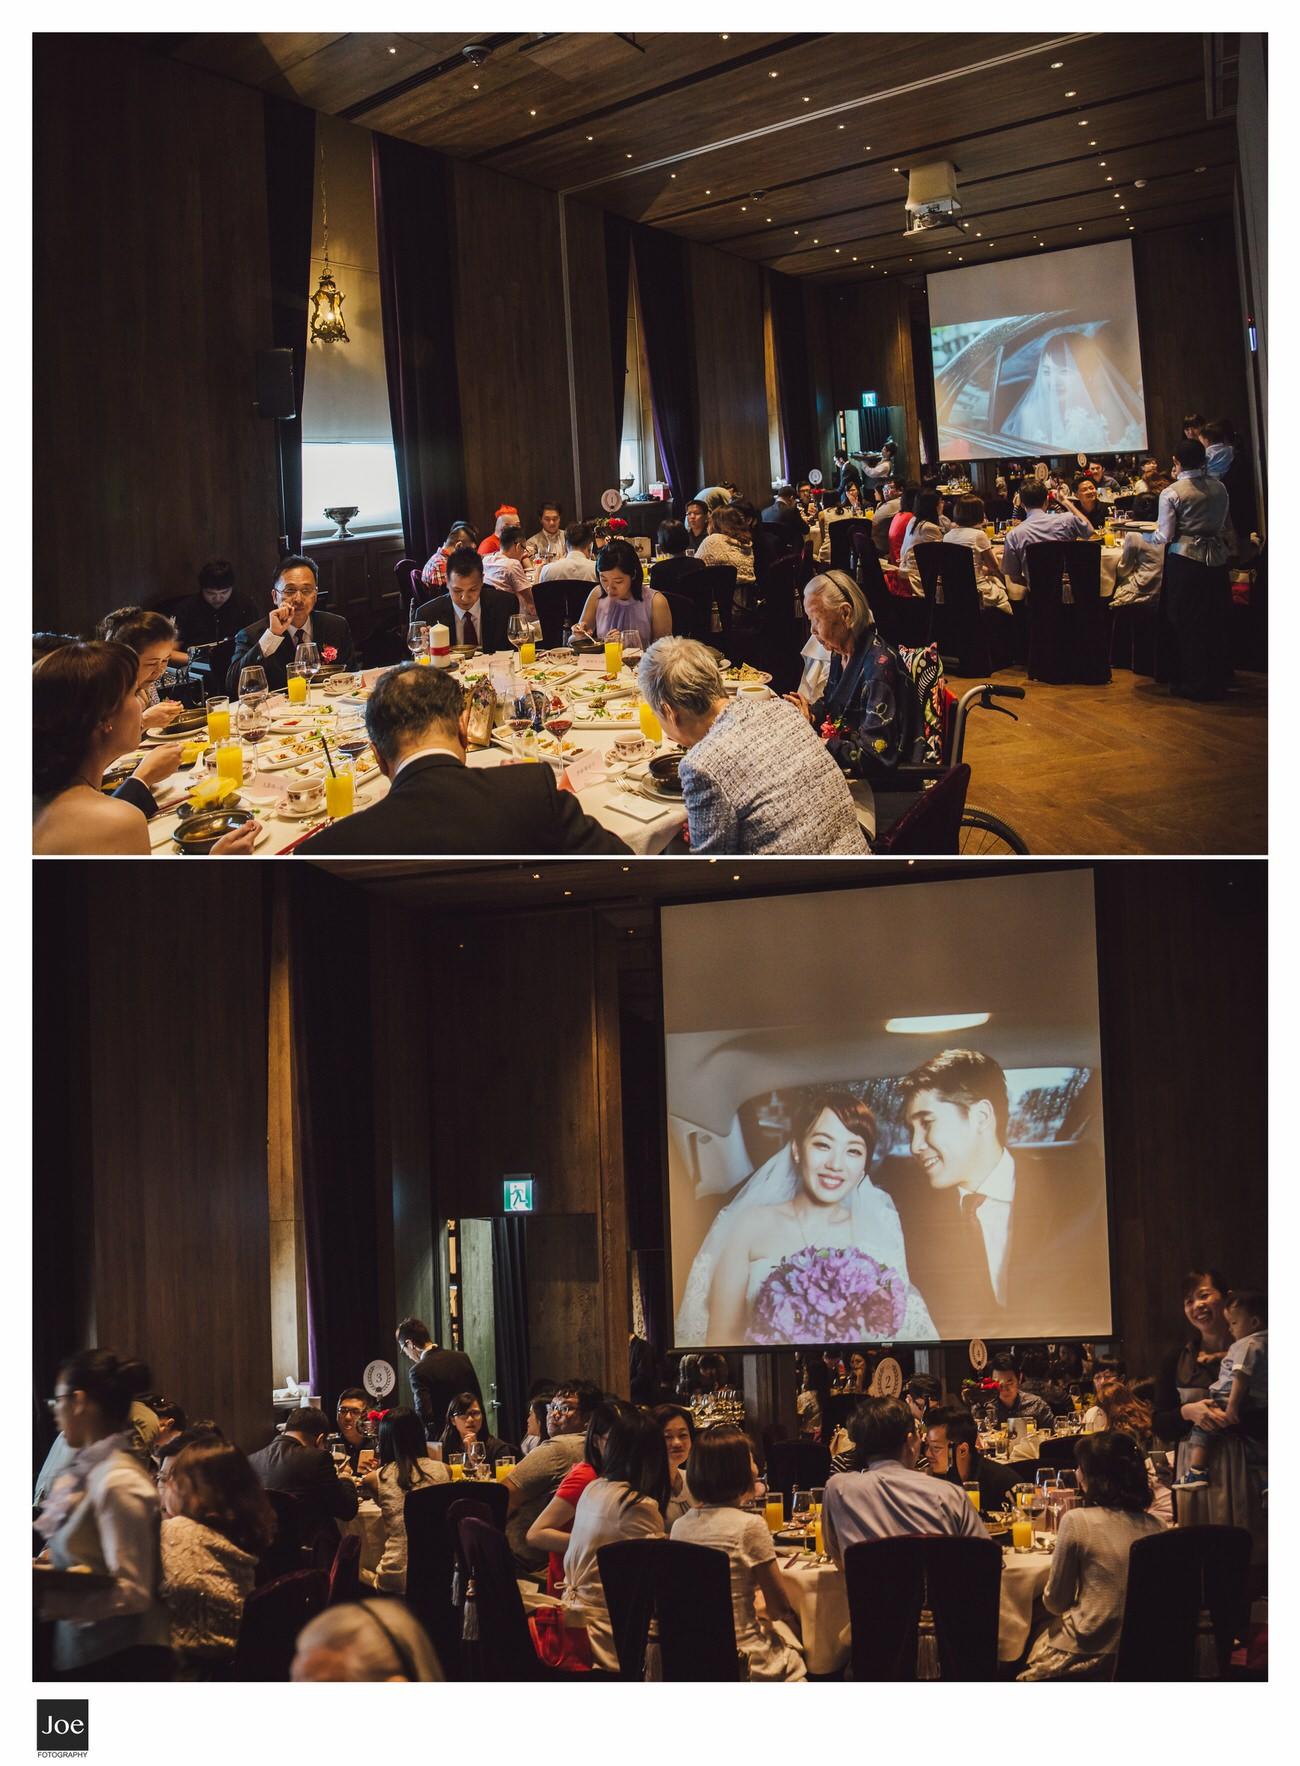 joe-fotography-wedding-photo-palais-de-chine-hotel-038.jpg